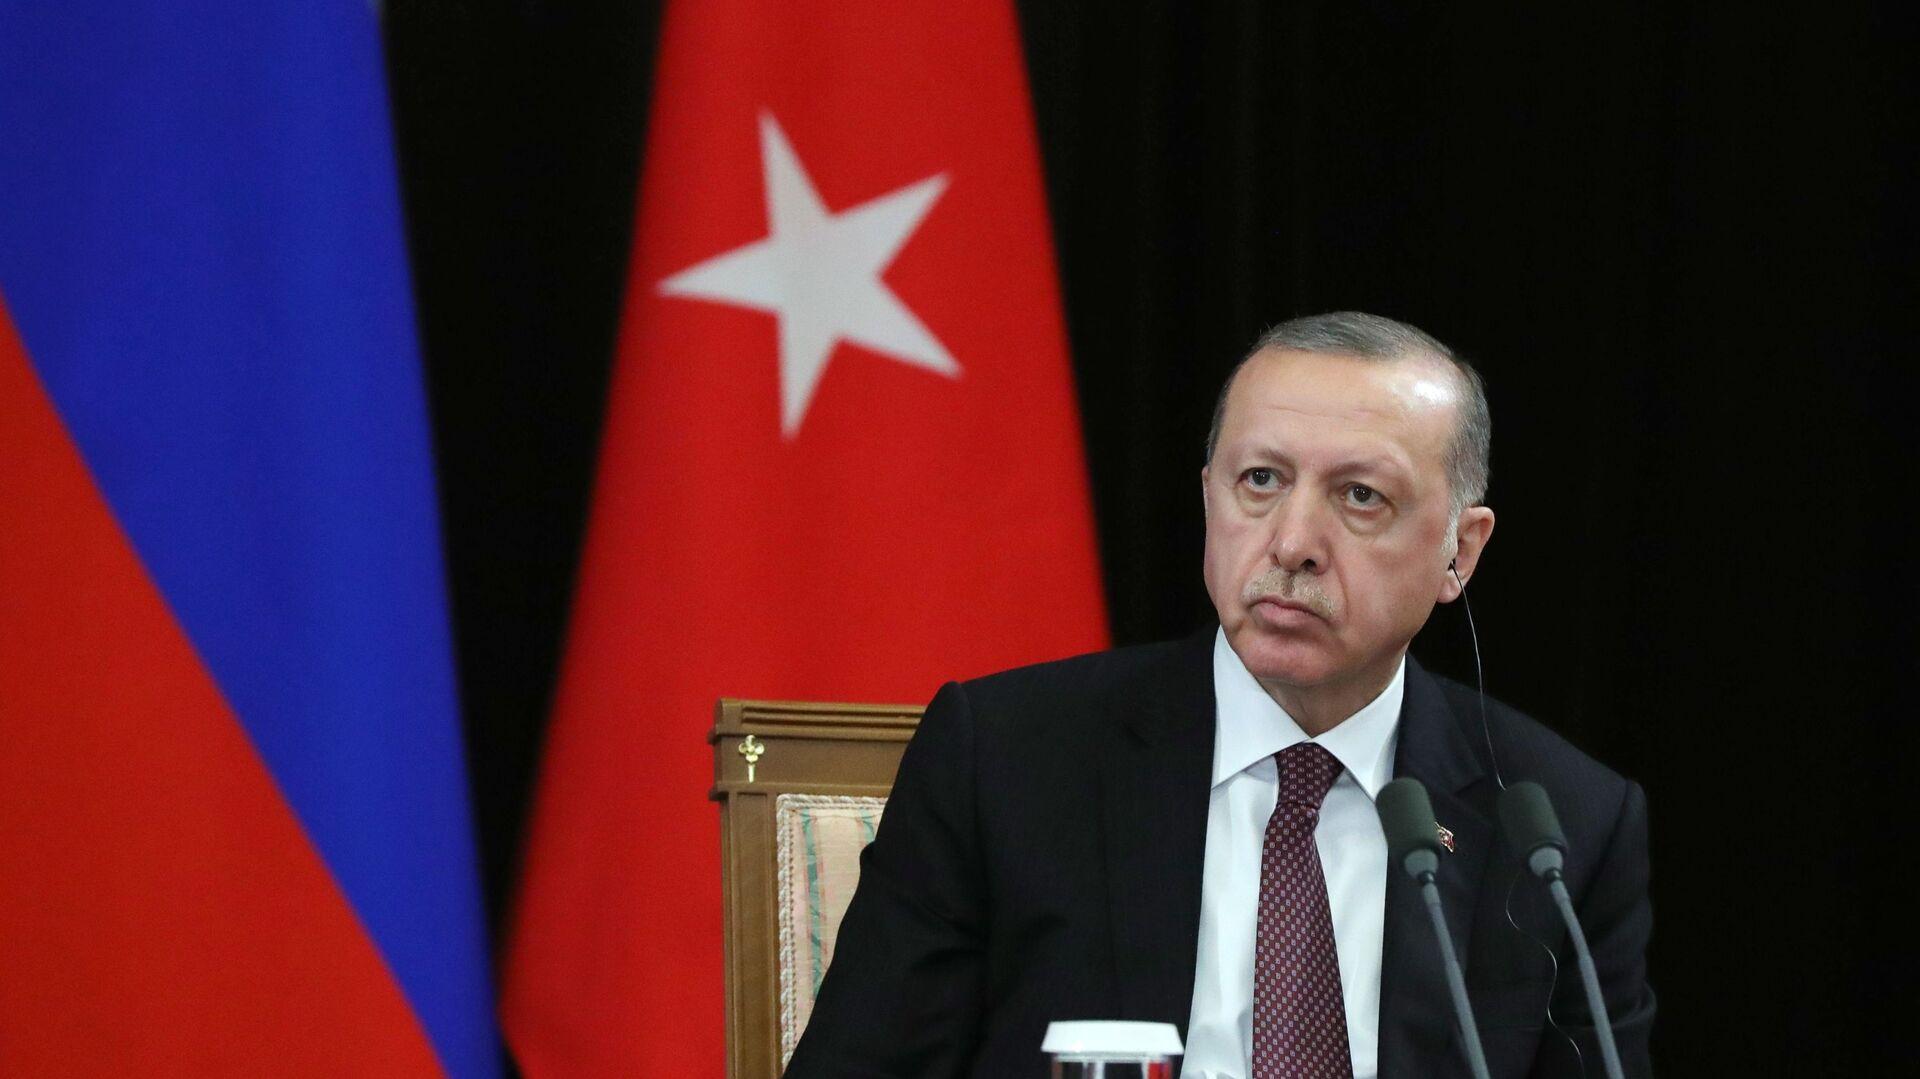 Il presidente turco Recep Tayyip Erdogan - Sputnik Italia, 1920, 17.08.2021